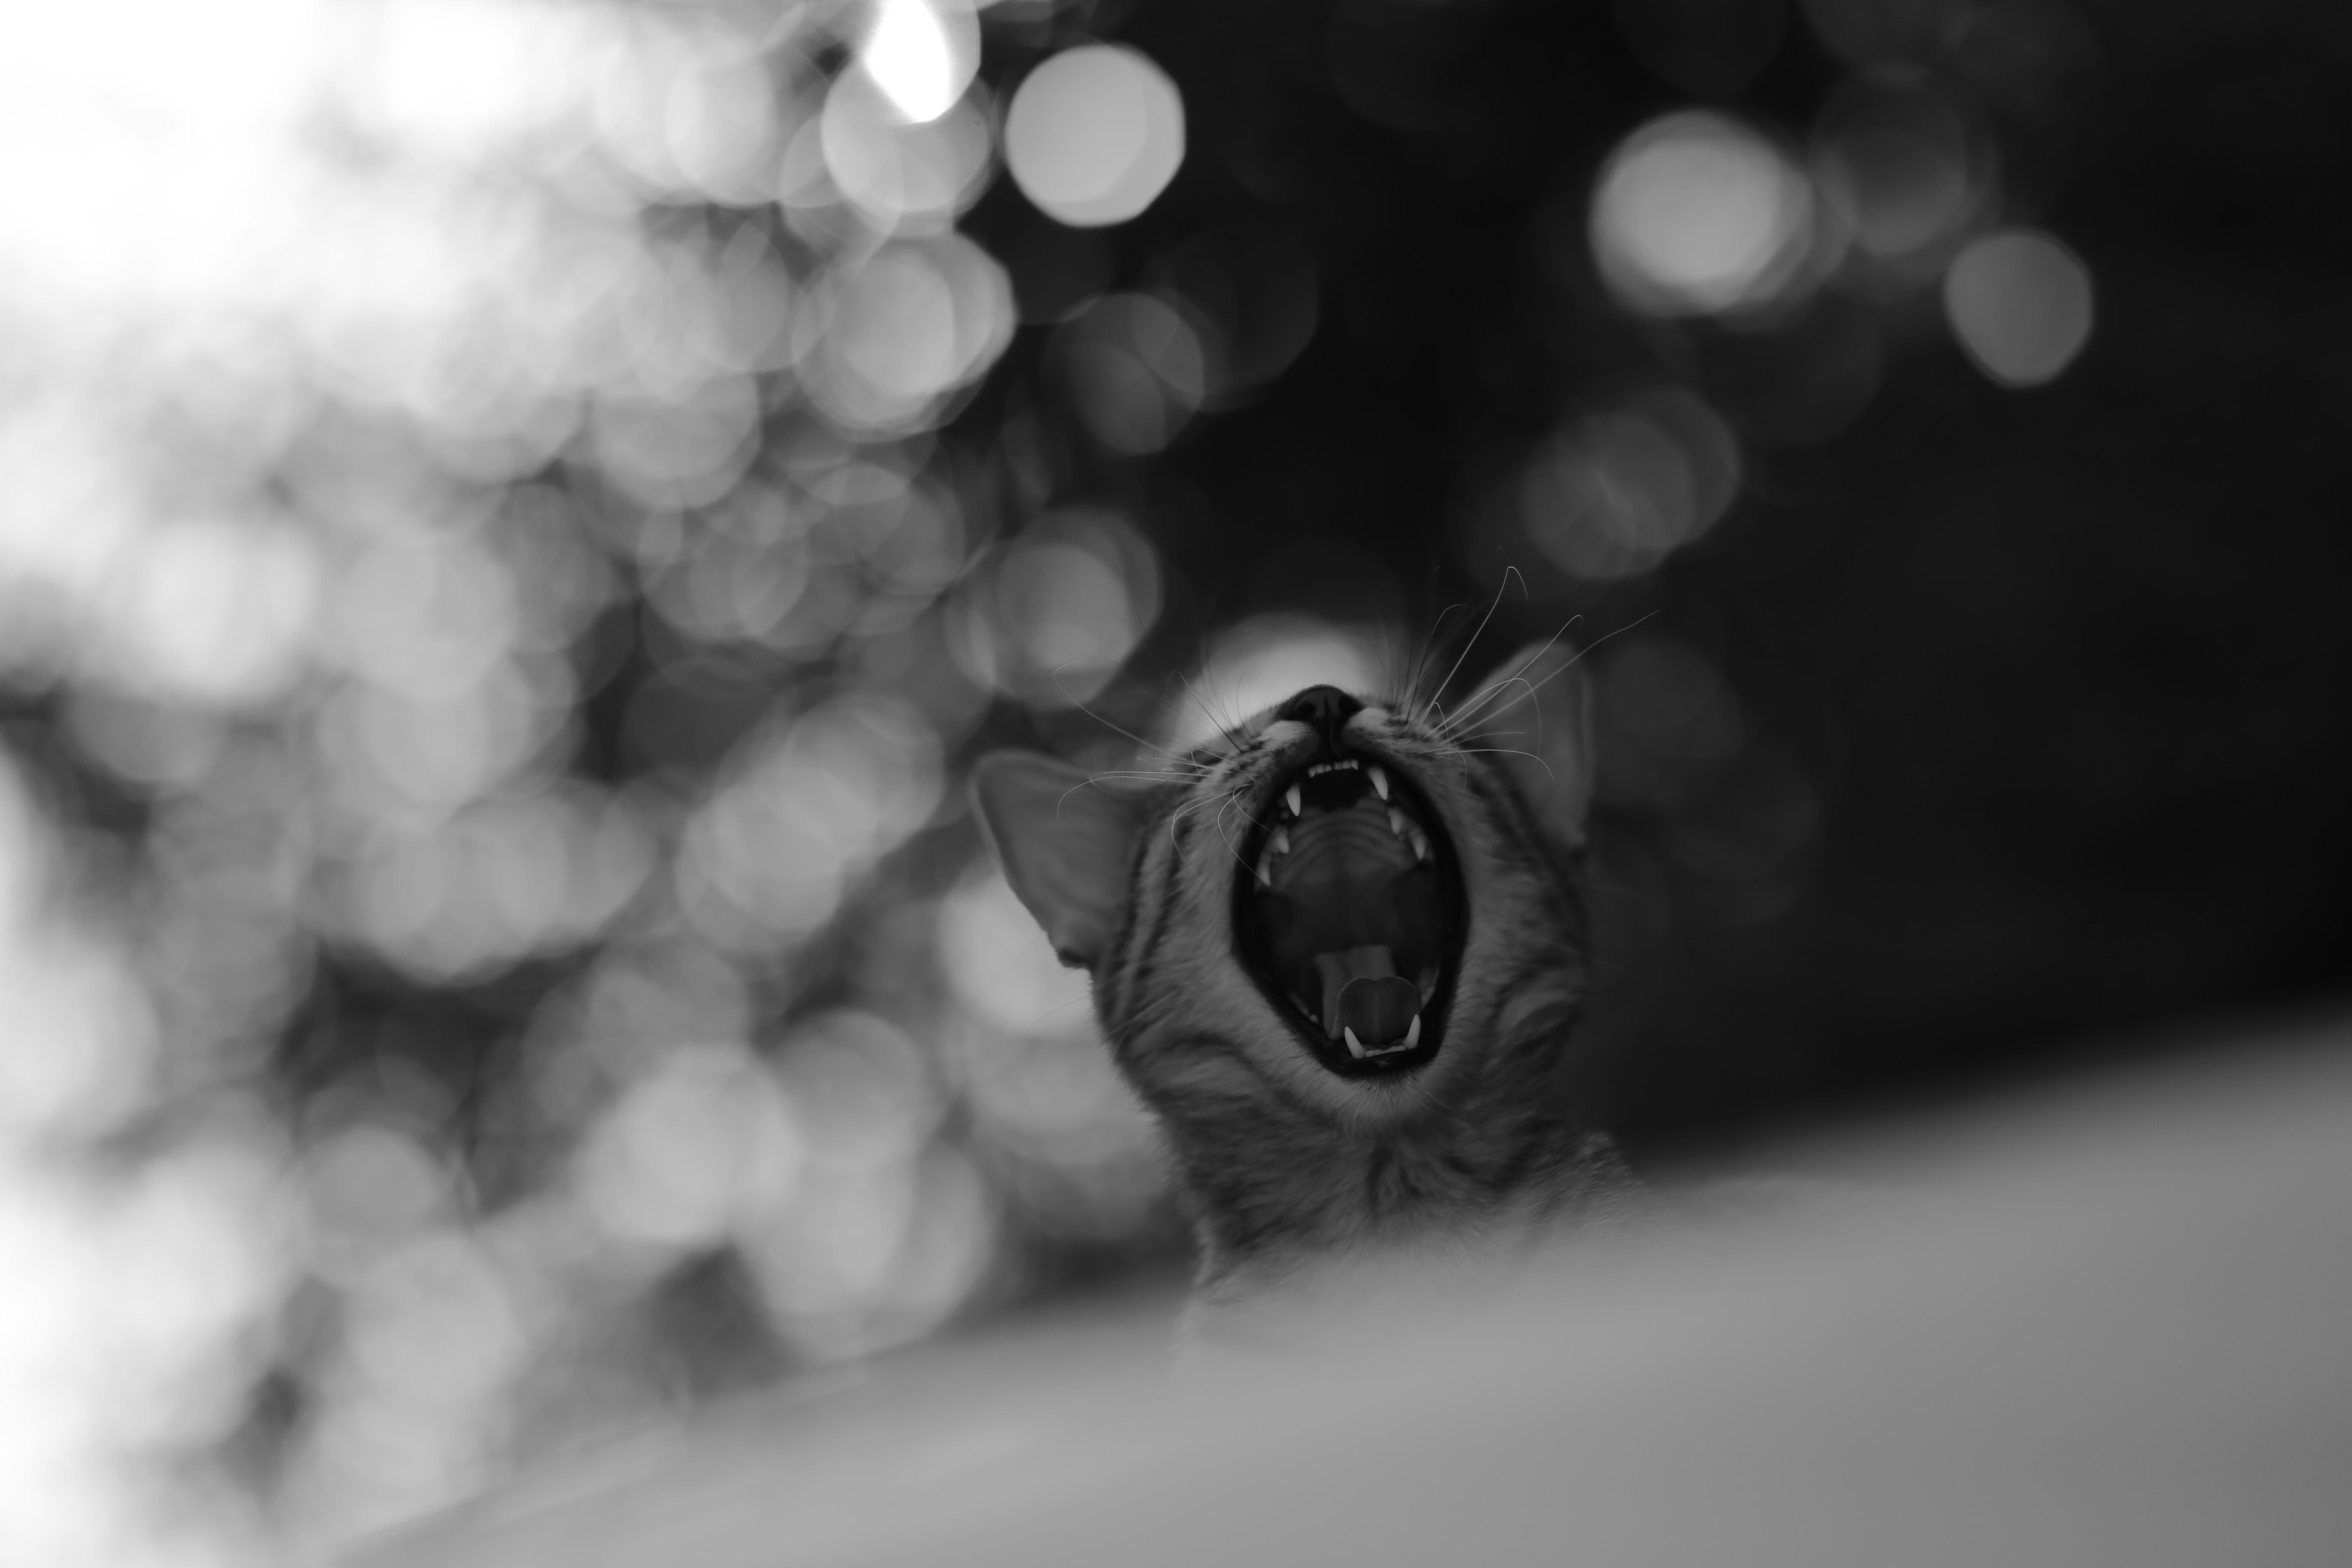 grayscale photo of yawning cat